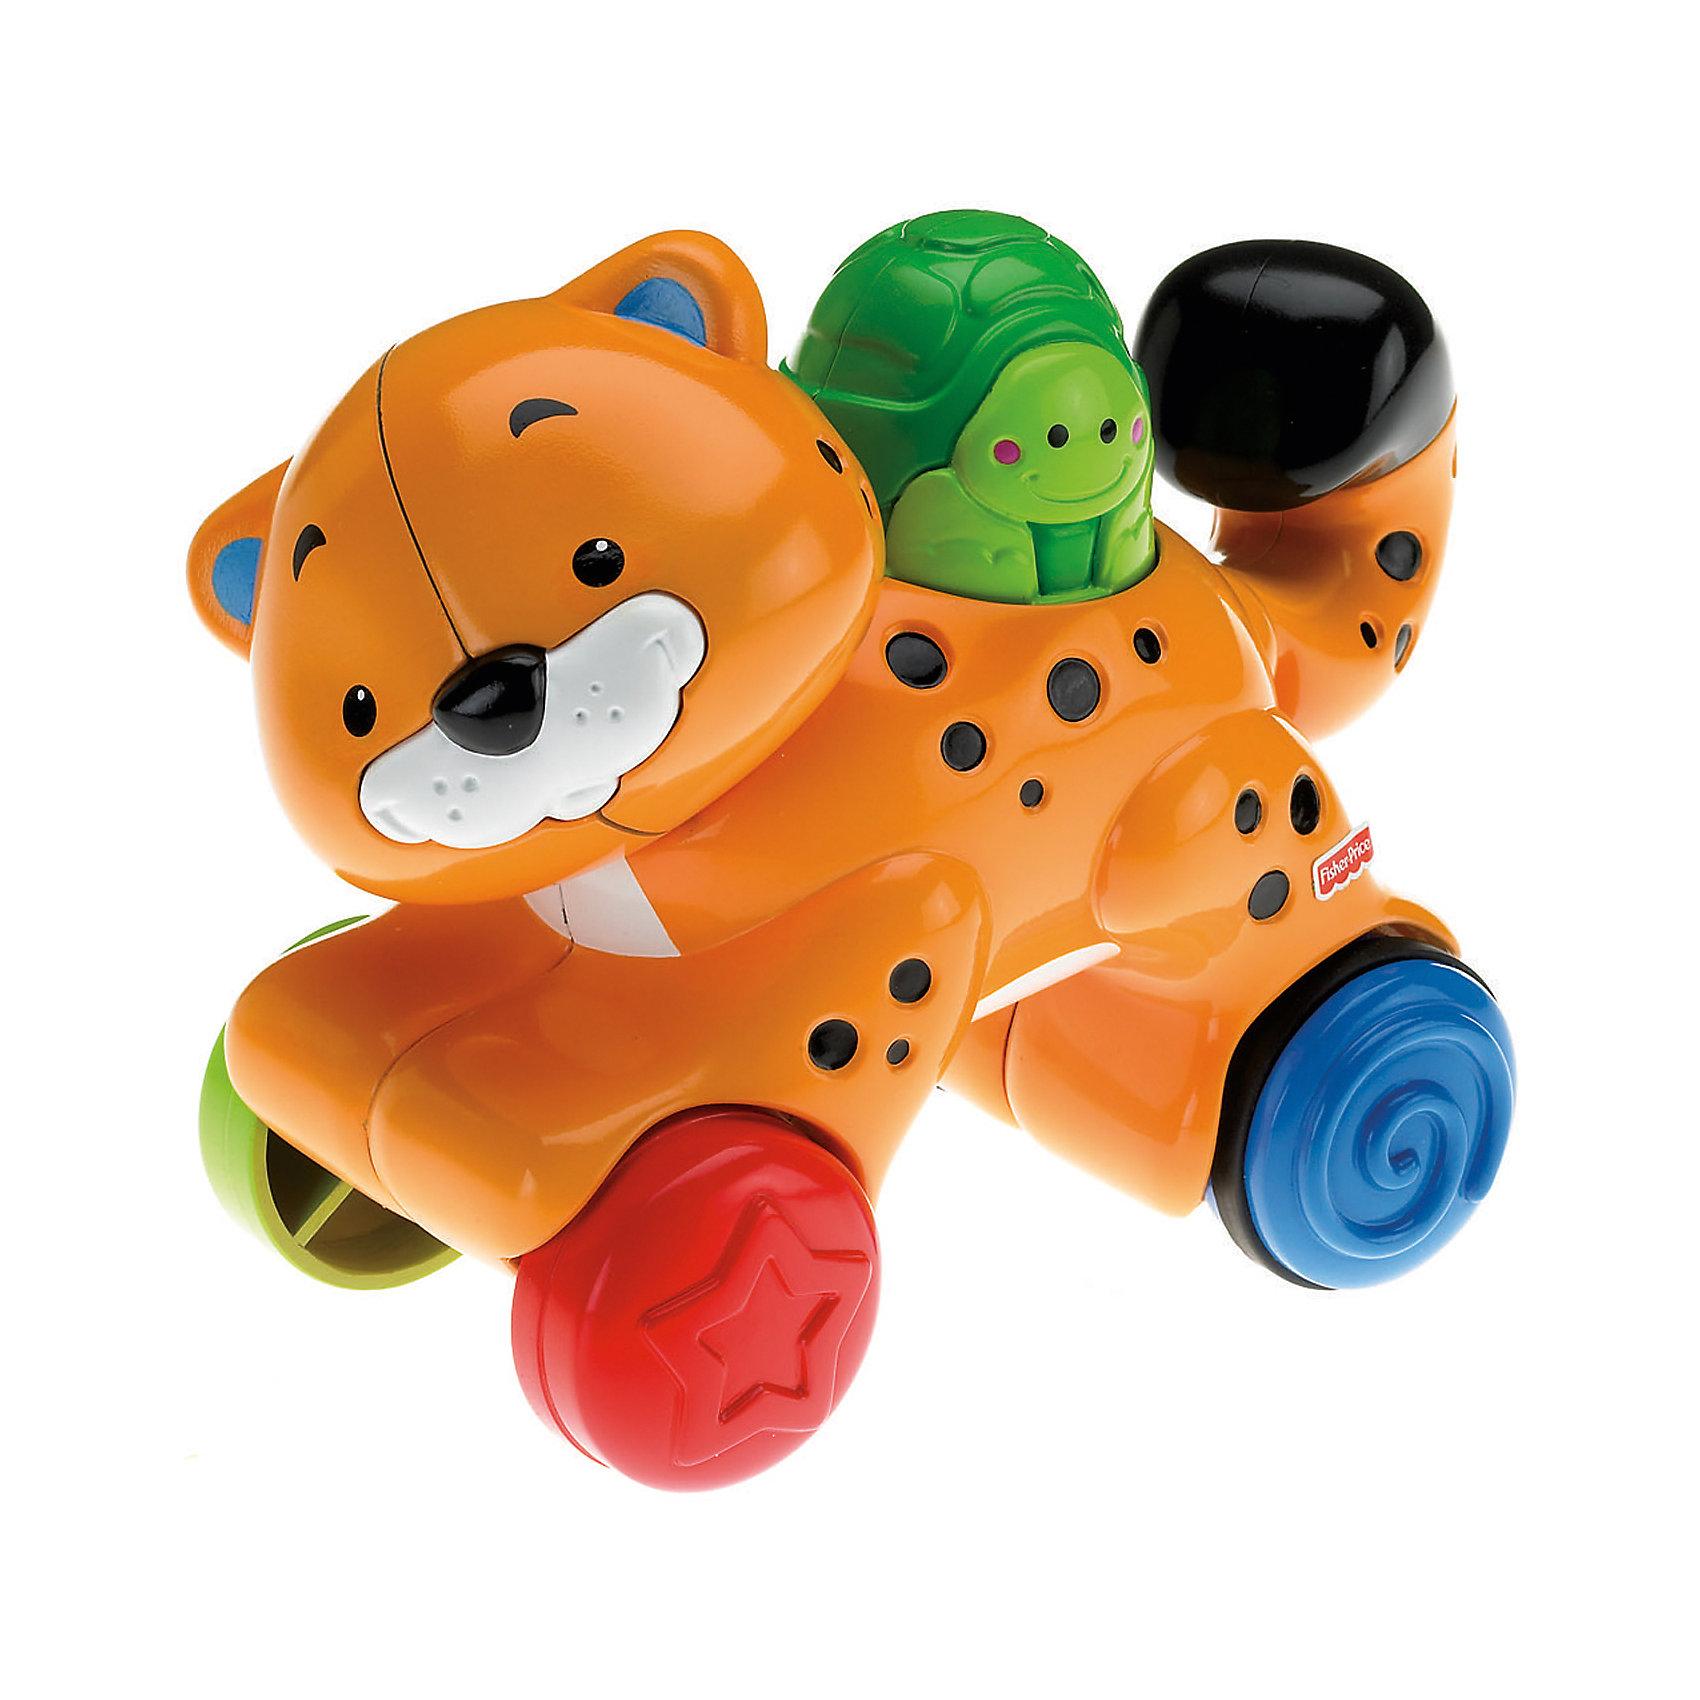 ������� ����������� ������� ��������, Fisher-Price (Mattel)